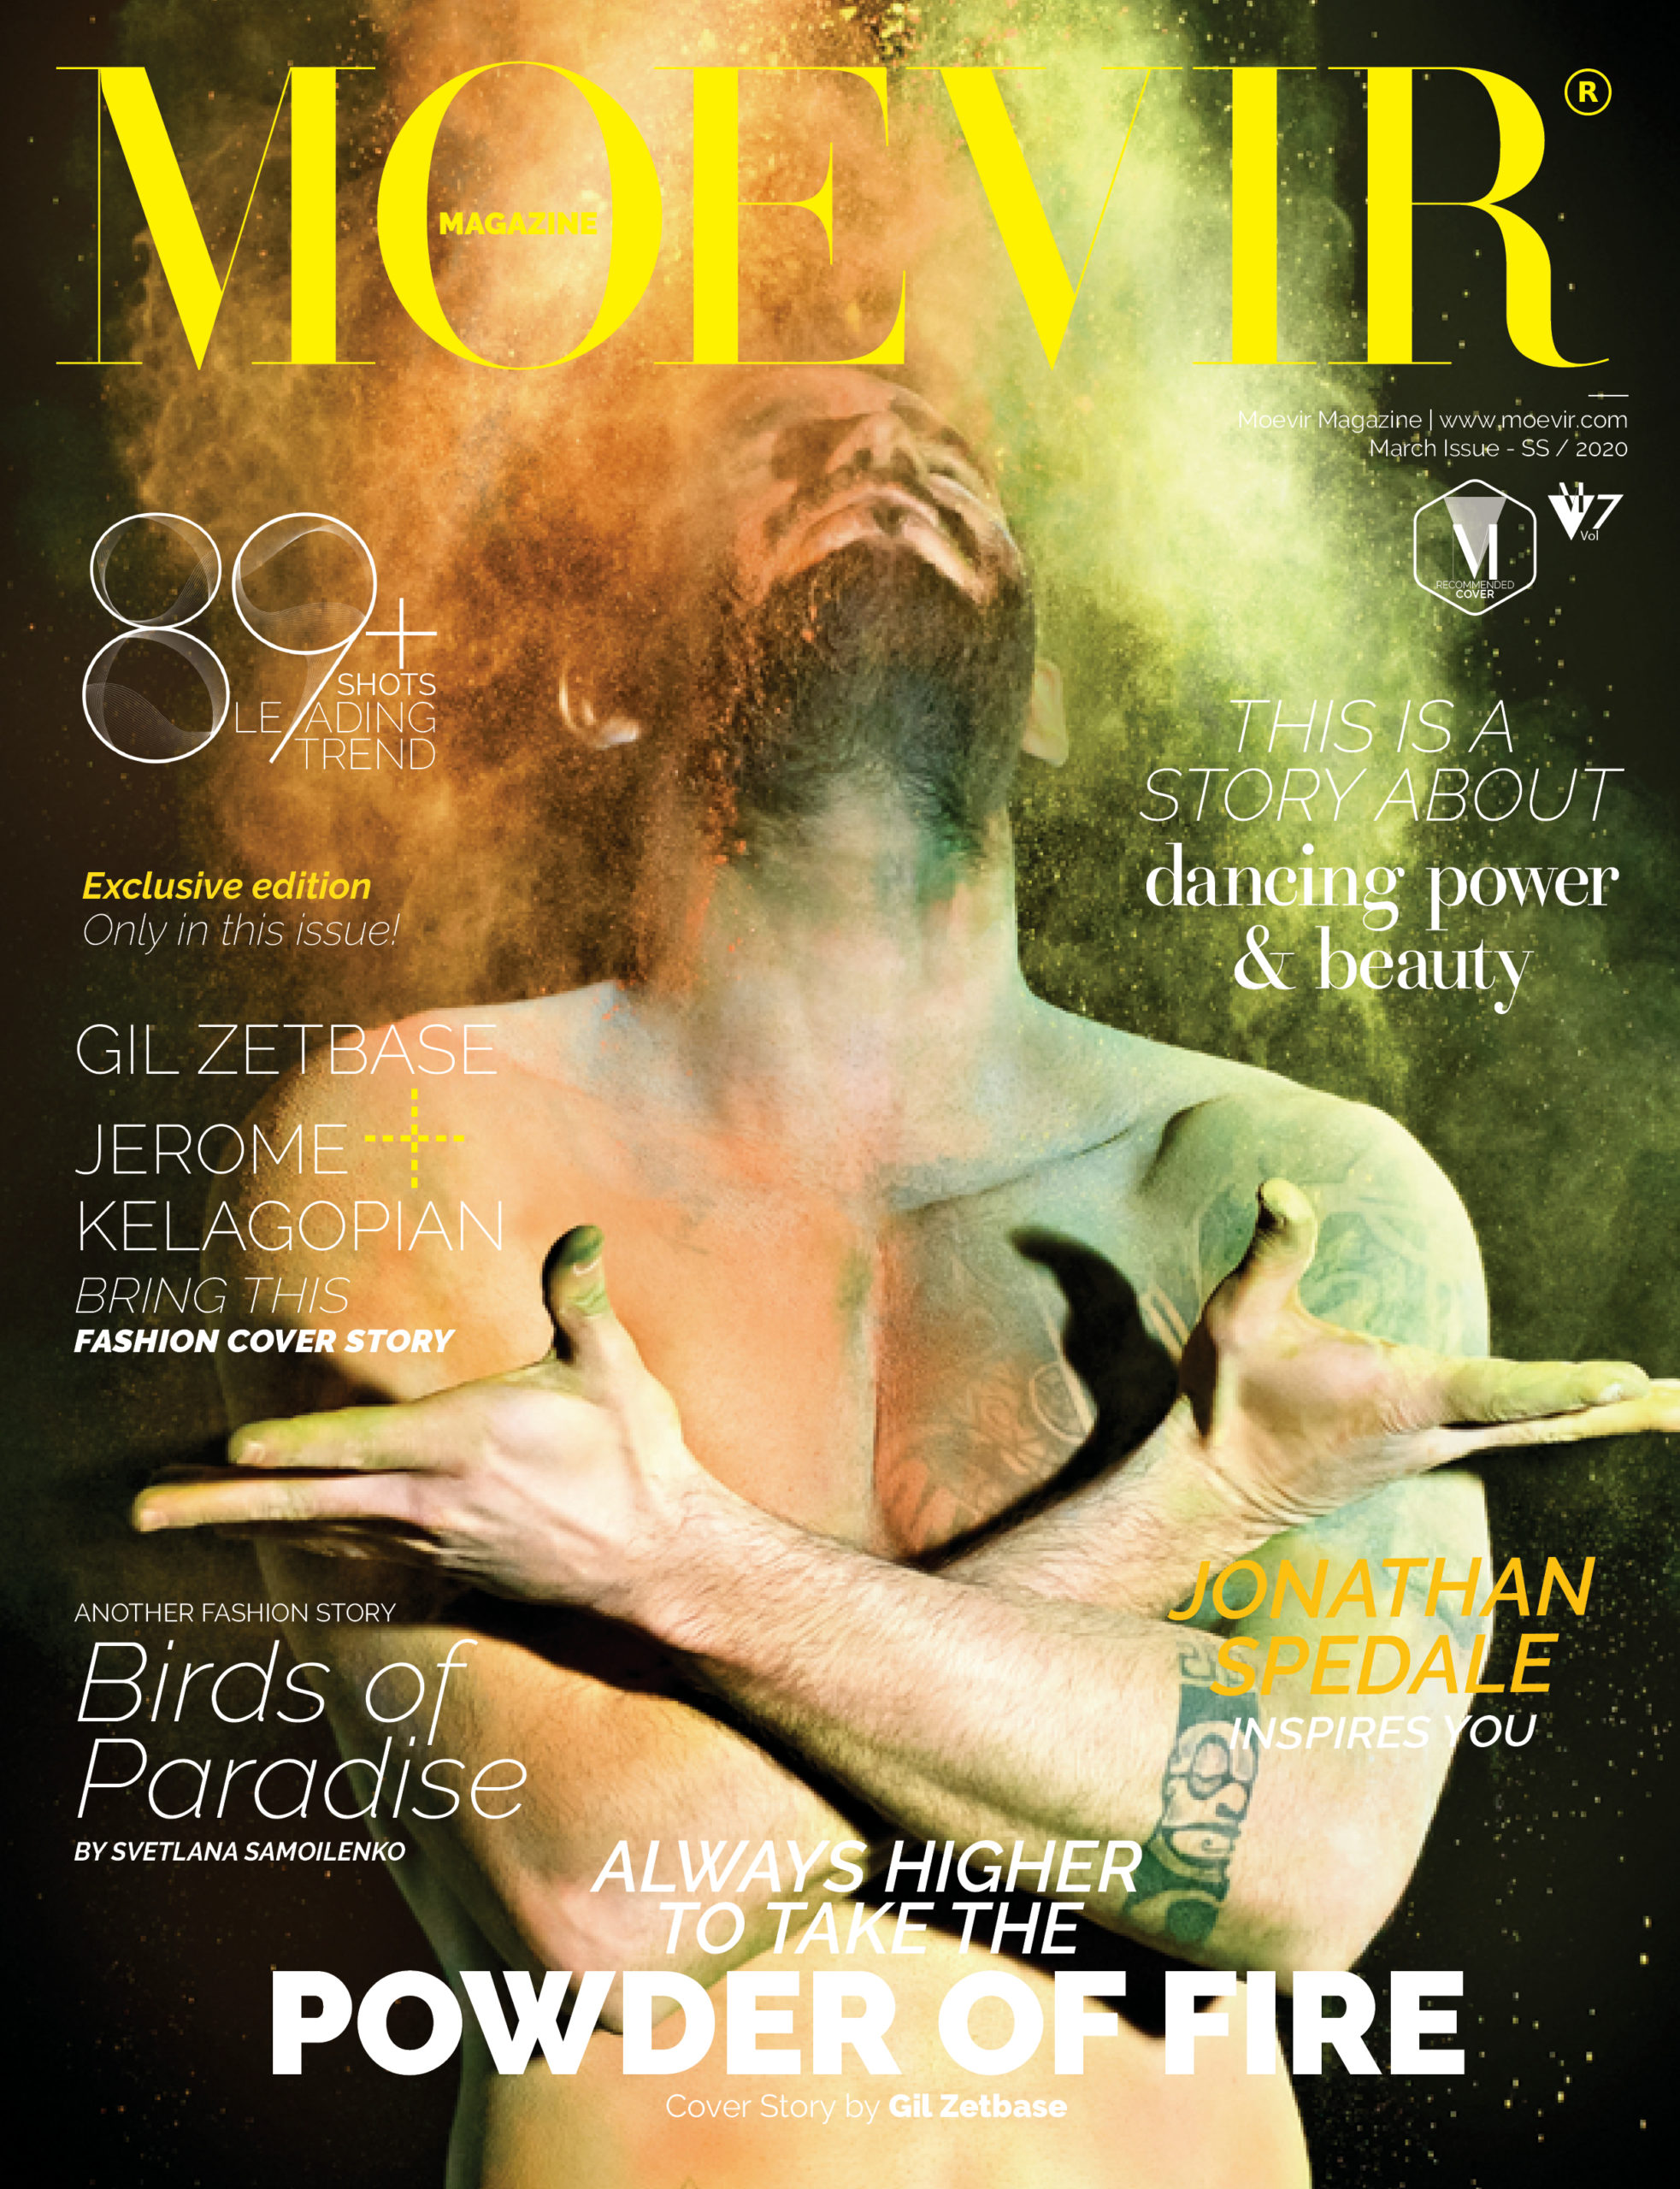 Moevir Magazine Gil Zetbase